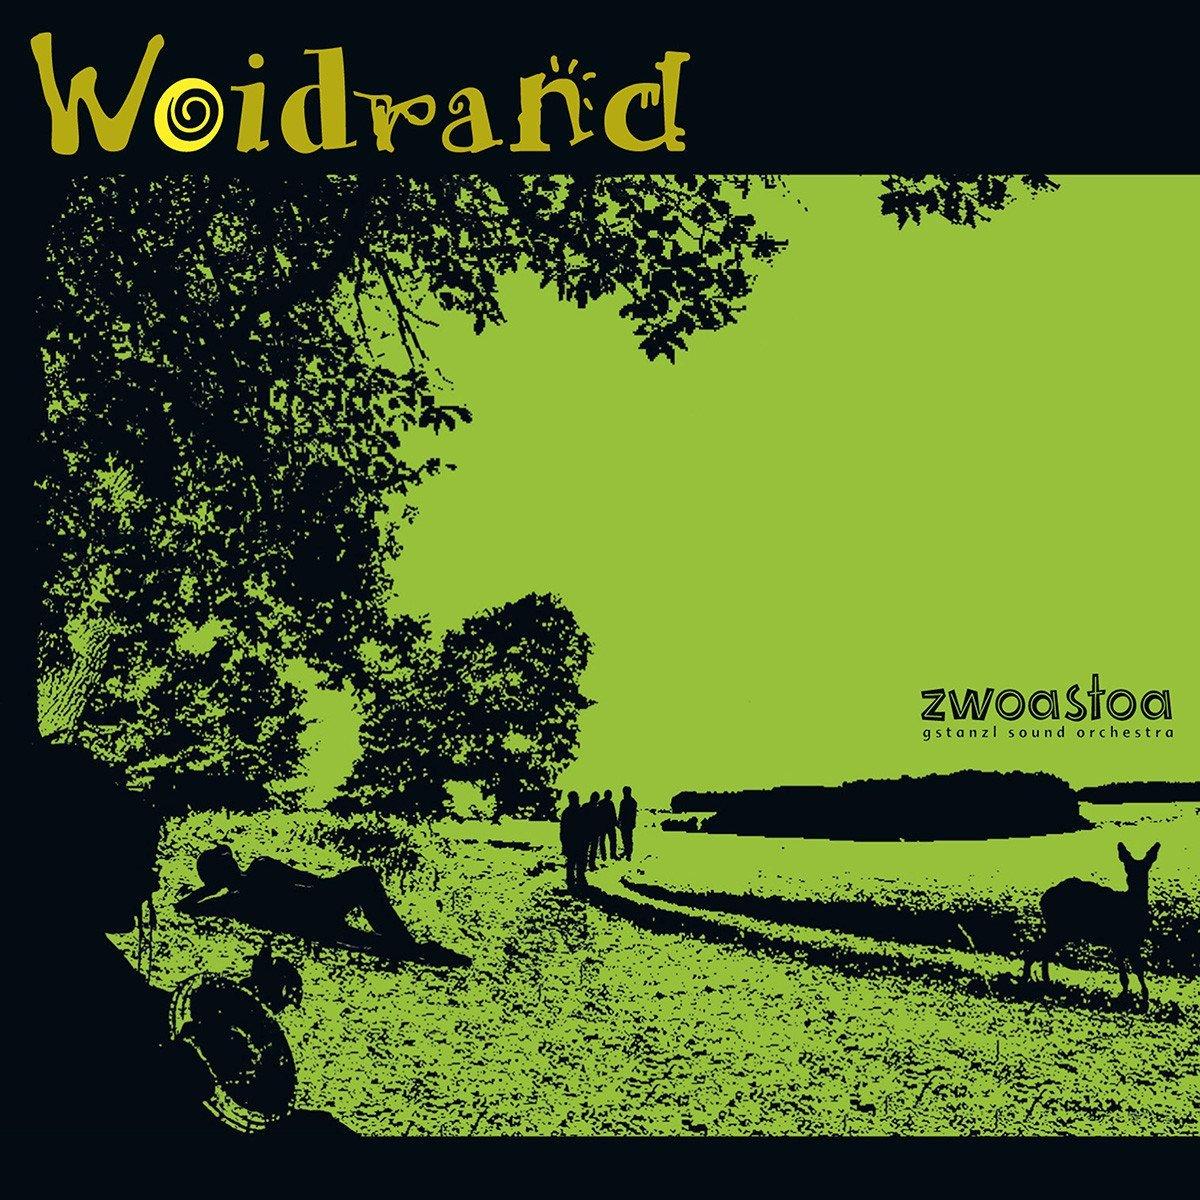 zwoastoa- woidrand cd cover